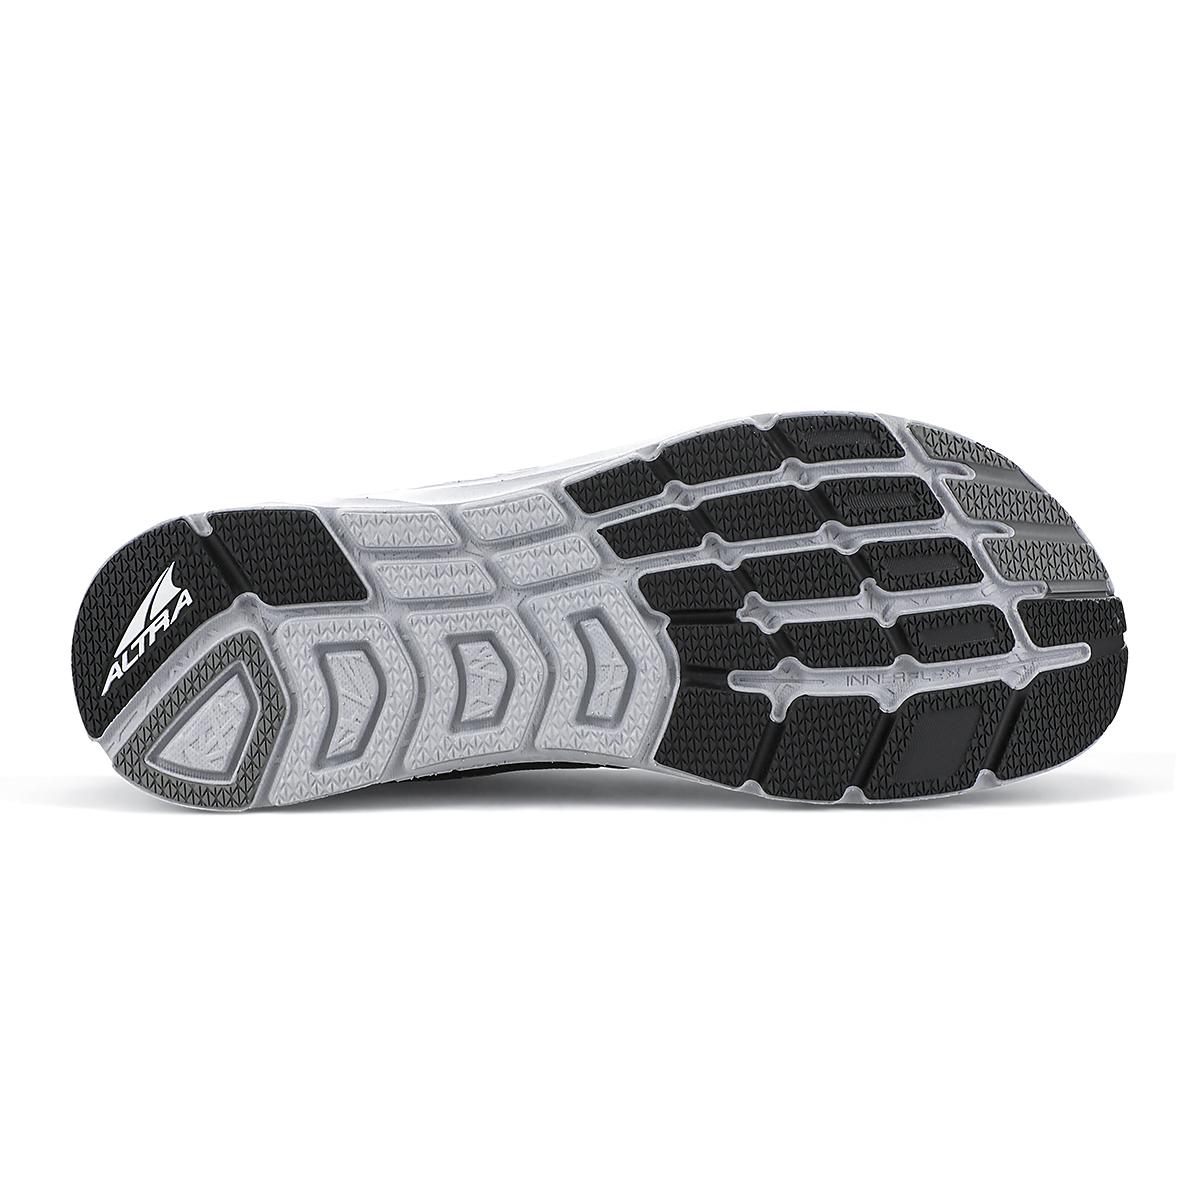 Men's Altra Rivera Running Shoe - Color: Black/Gray - Size: 7 - Width: Regular, Black/Gray, large, image 4